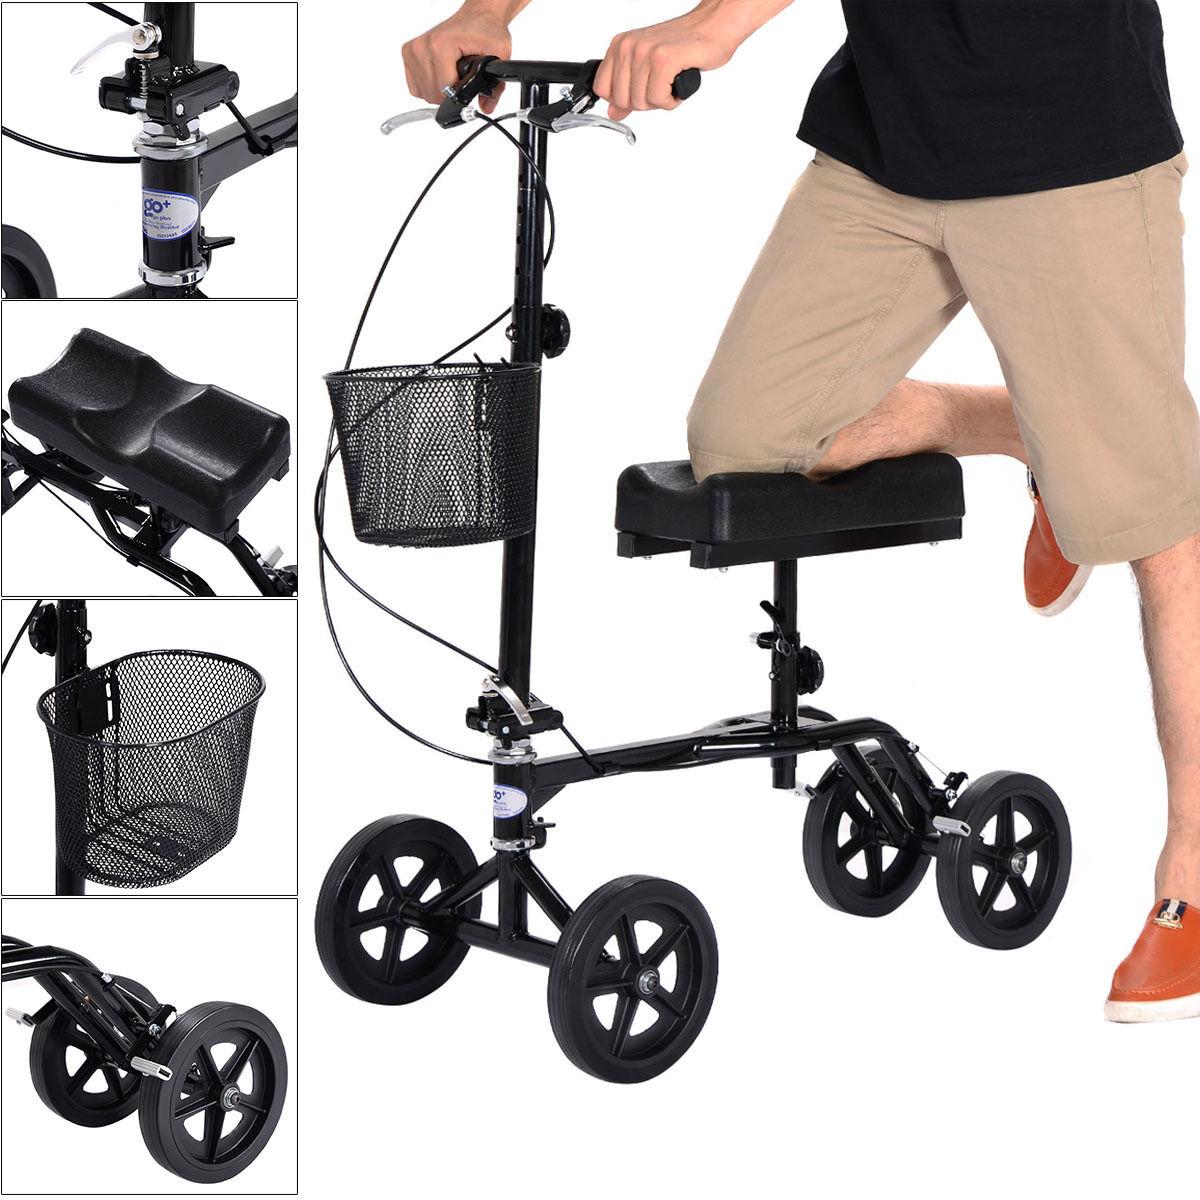 Costway Steerable Foldable Knee Walker Scooter Turning Brake Basket Drive Cart Black